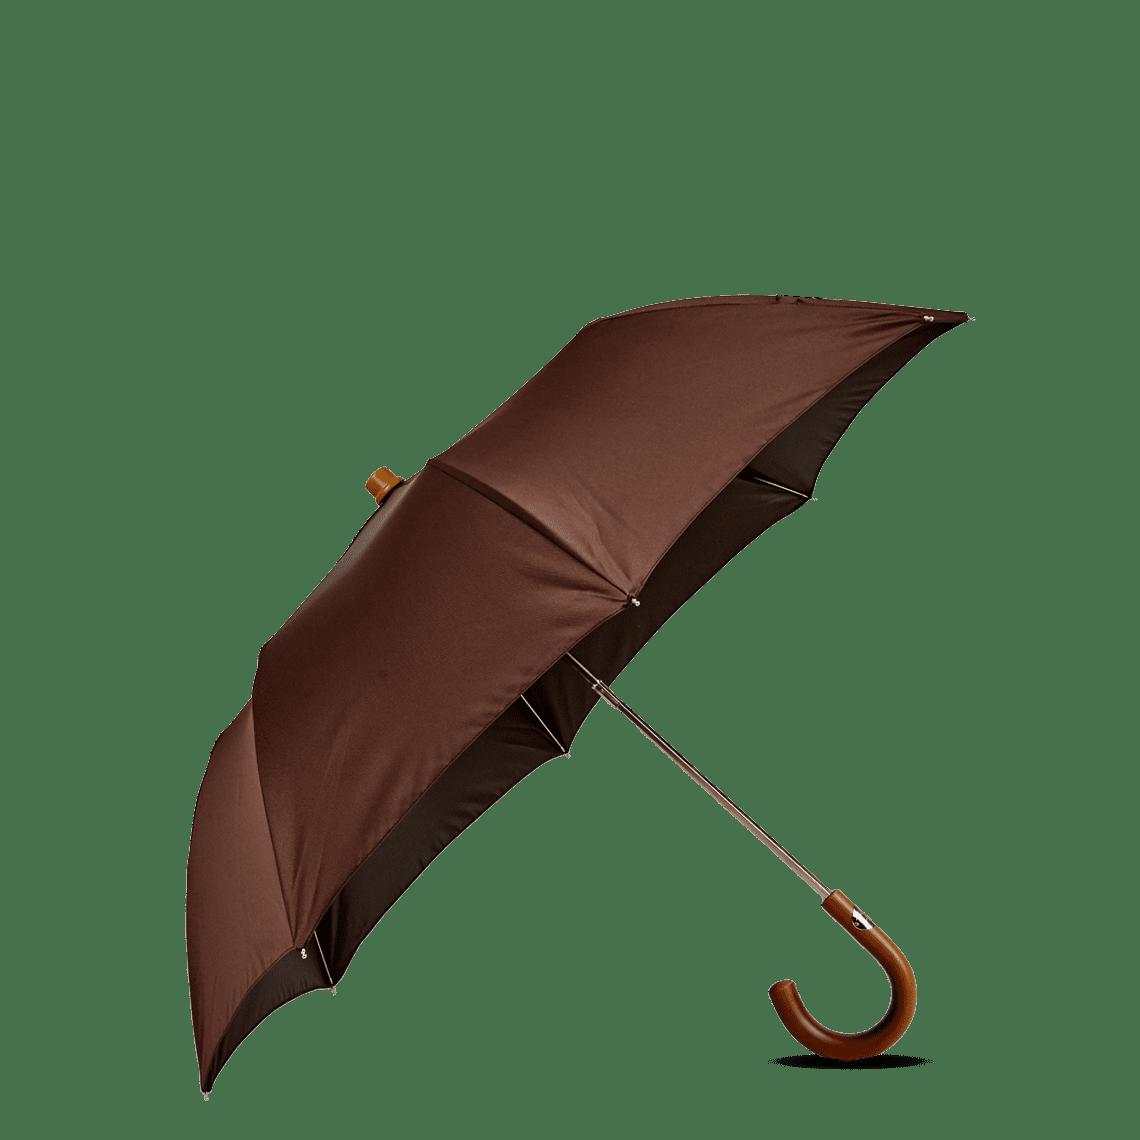 Maglia Francesco Brown Foldable Umbrella Feature